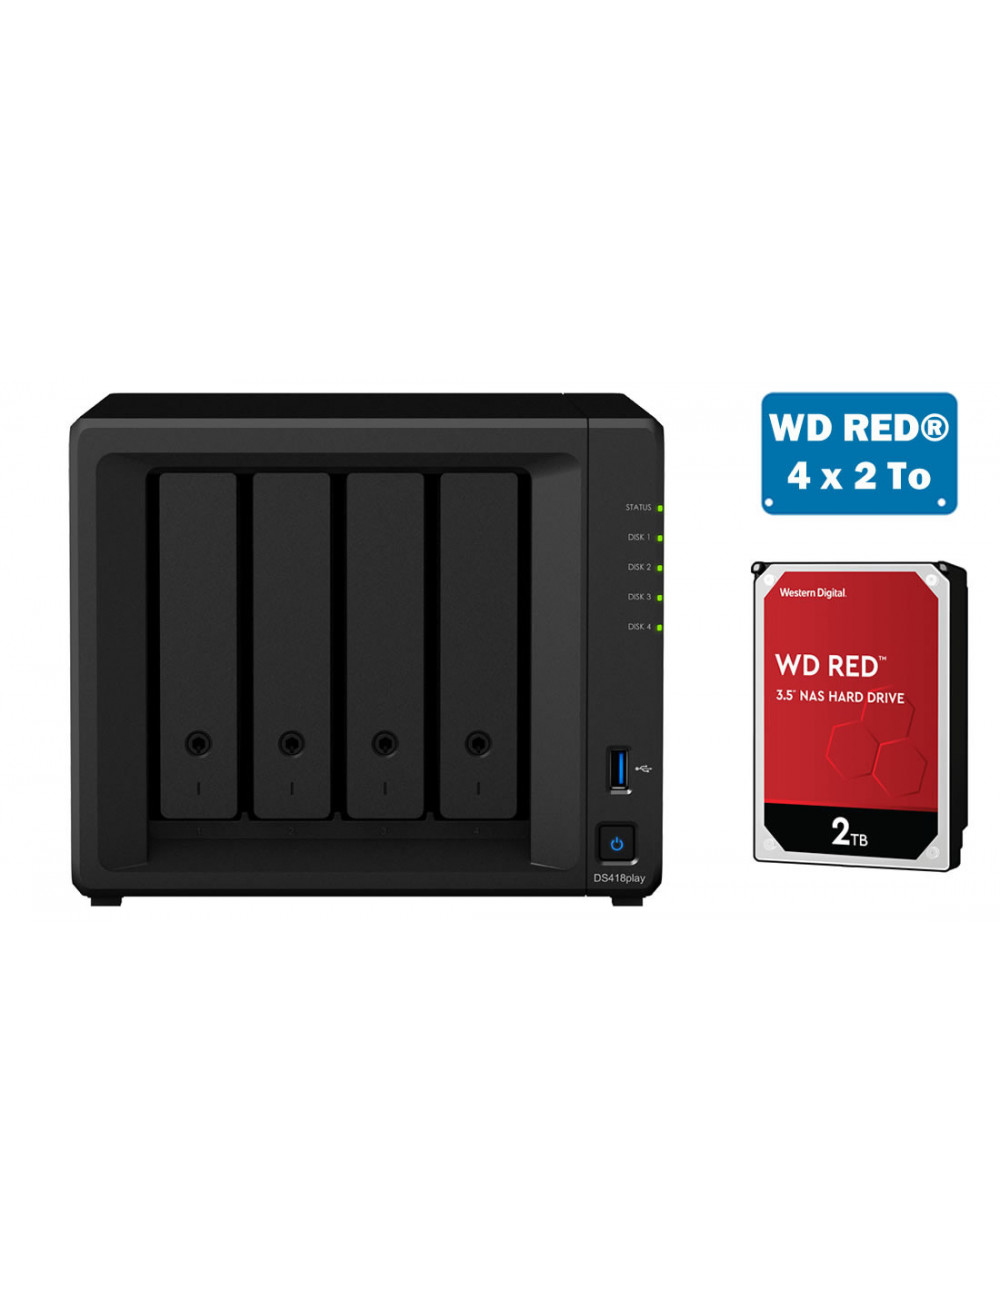 Synology DS418play NAS Server - SATA 6Gb / s - 8 TB